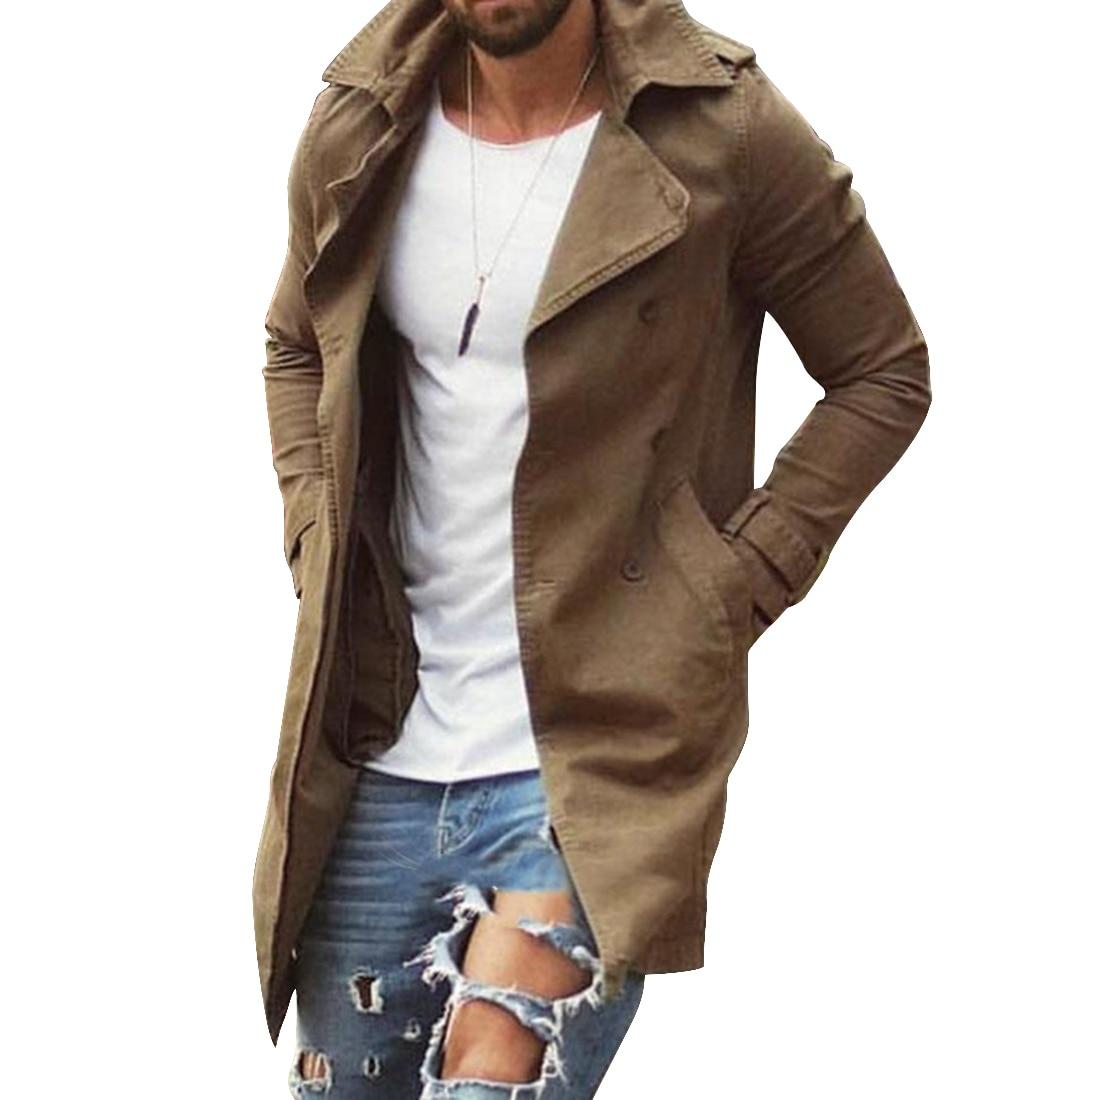 Spring Autumn Men Trench Coat Jacket Slim Fit Plus Size Black Outwear Business Long Windproof Overcoat Jackets For Men 3